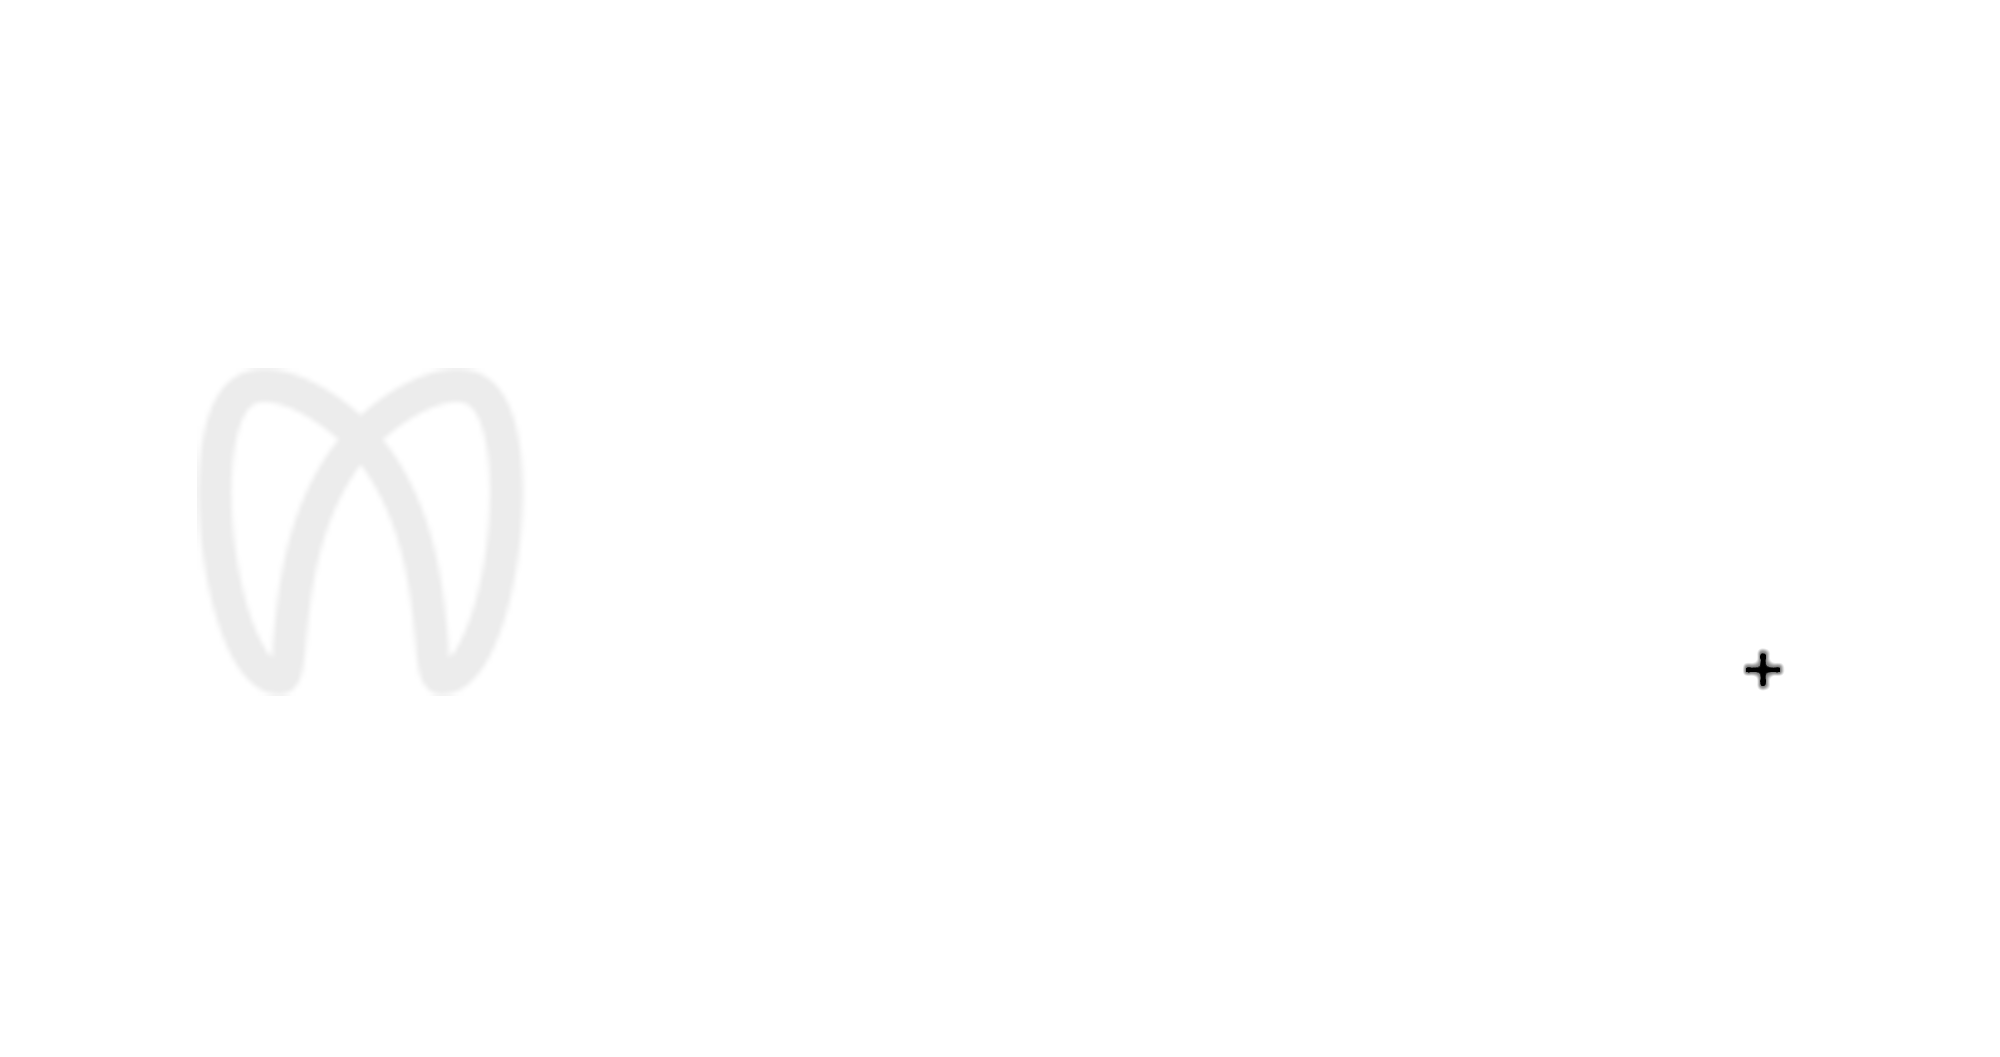 polydentia logo styleitaliano products